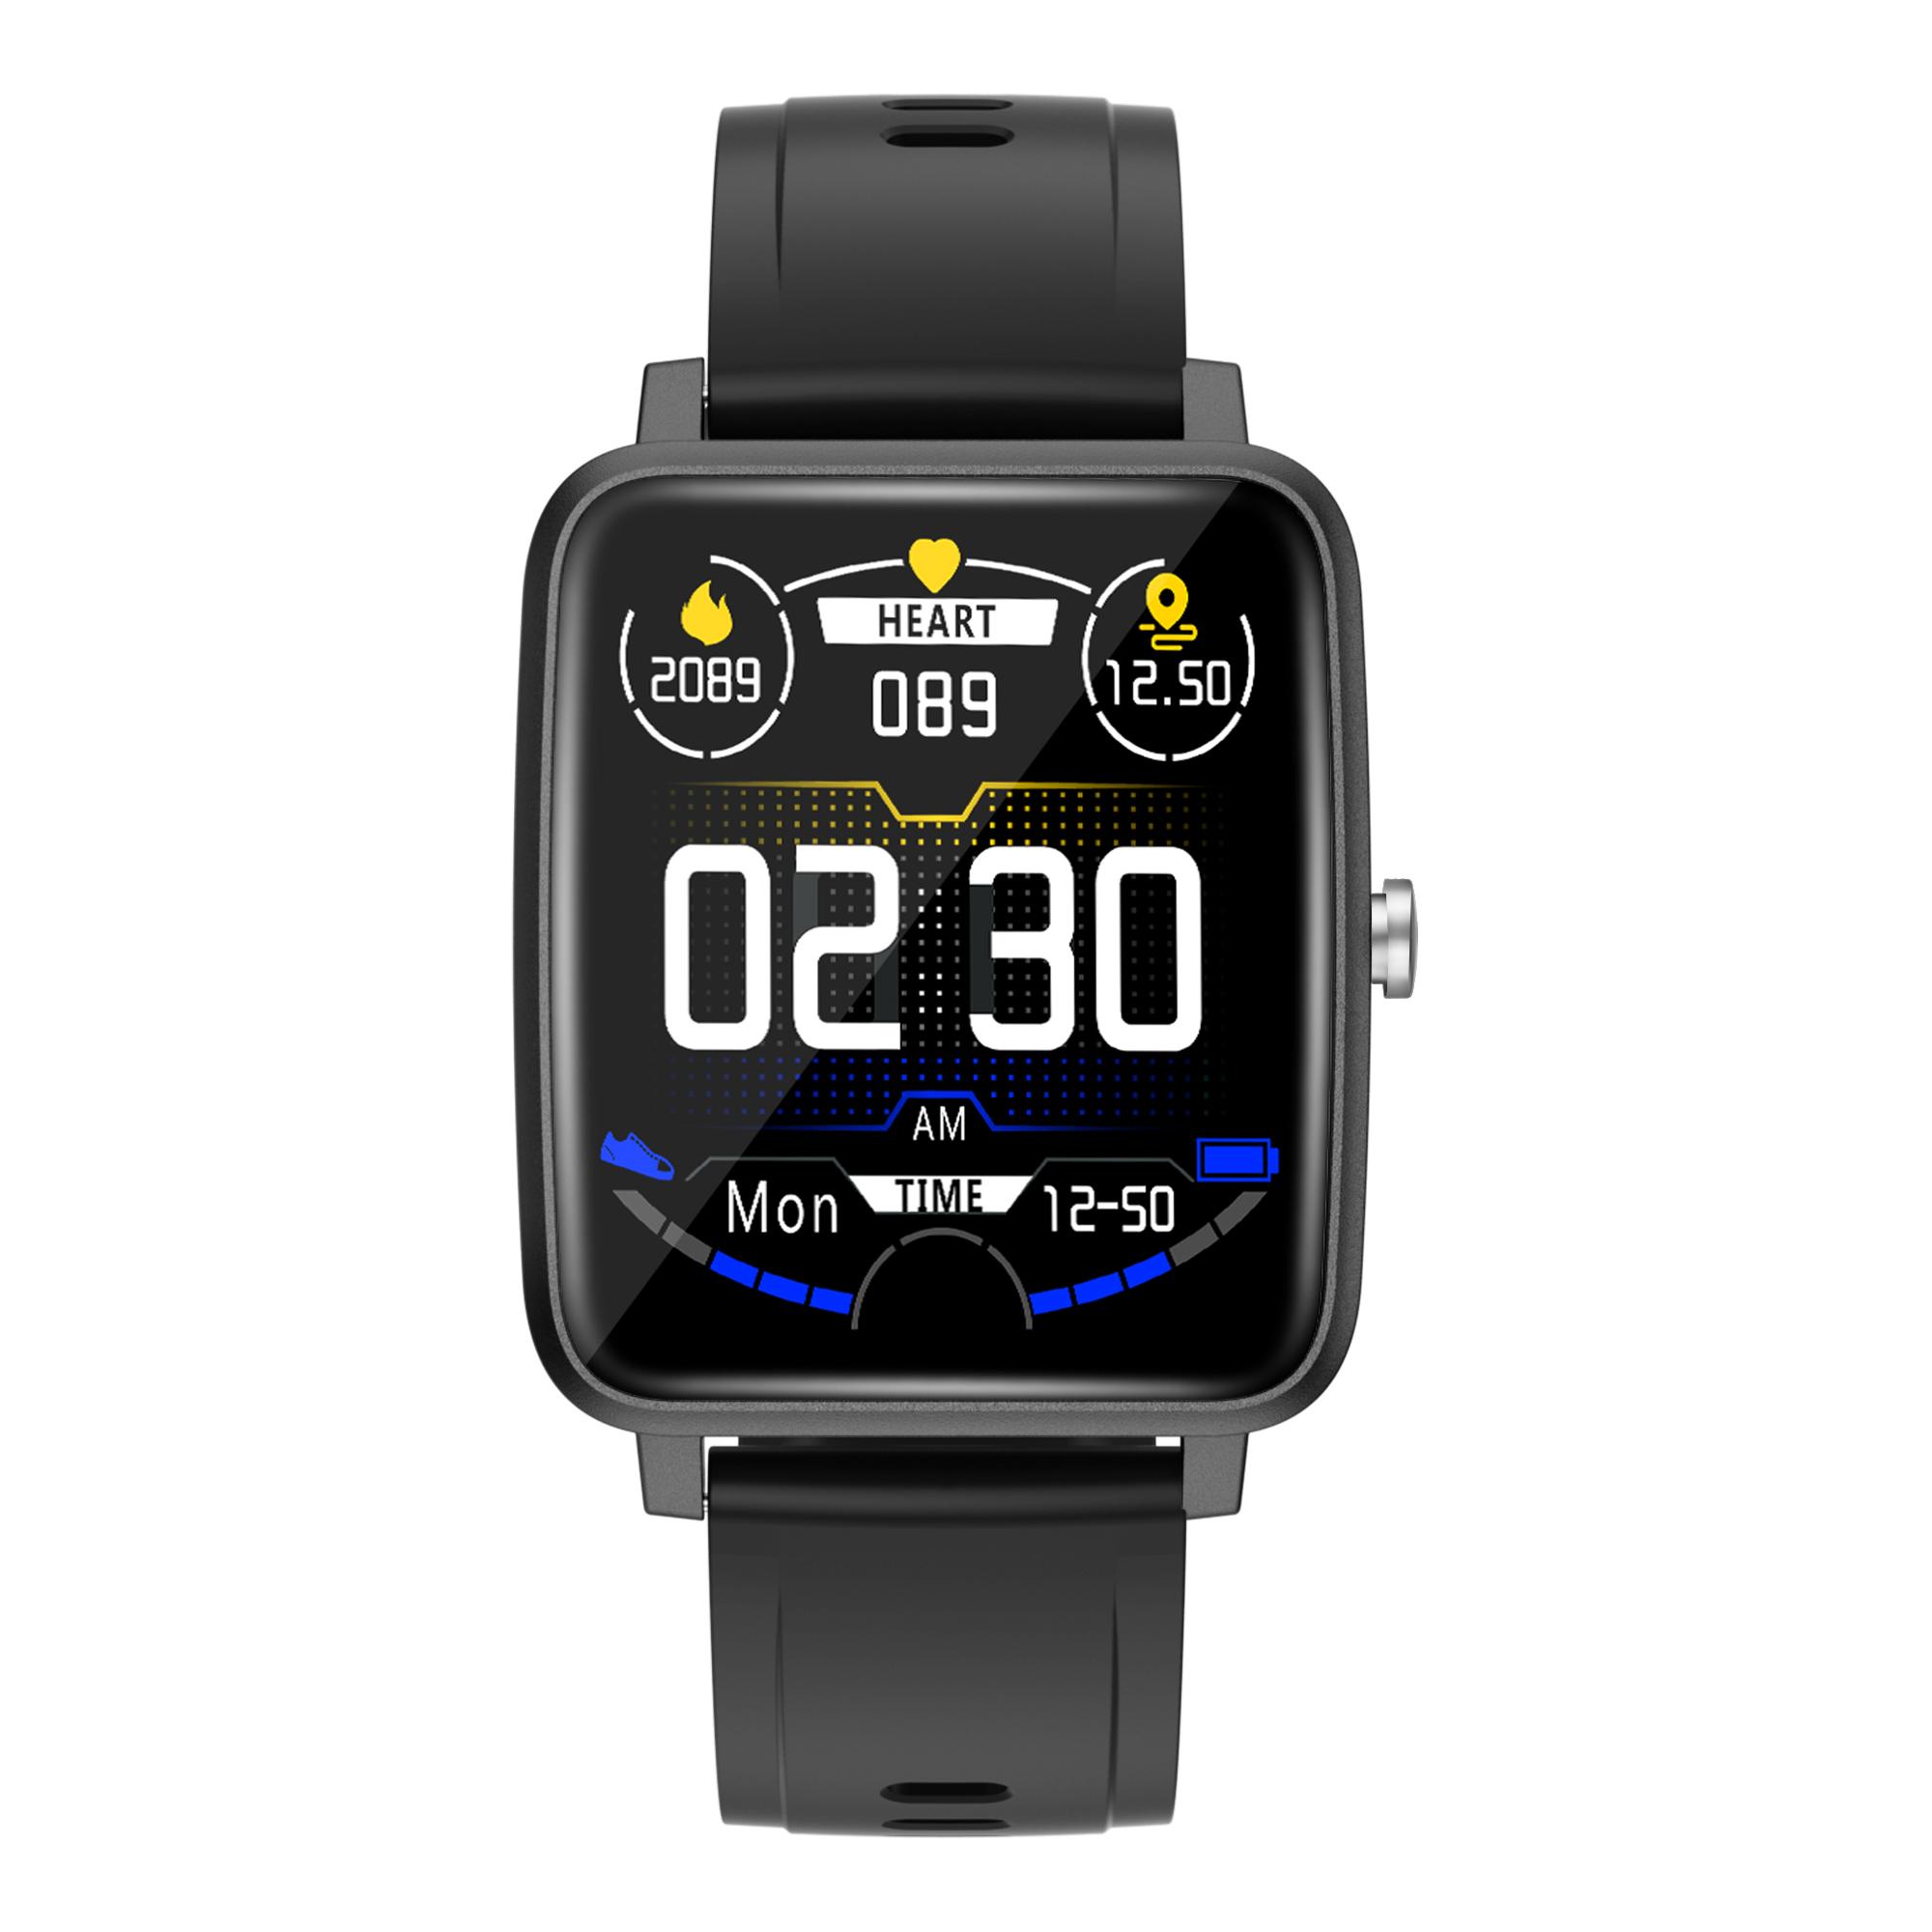 V10 Smart Watch Bluetooth Sports Health Wristband Heart Rate Fitness Pedometer Smartwatch Black